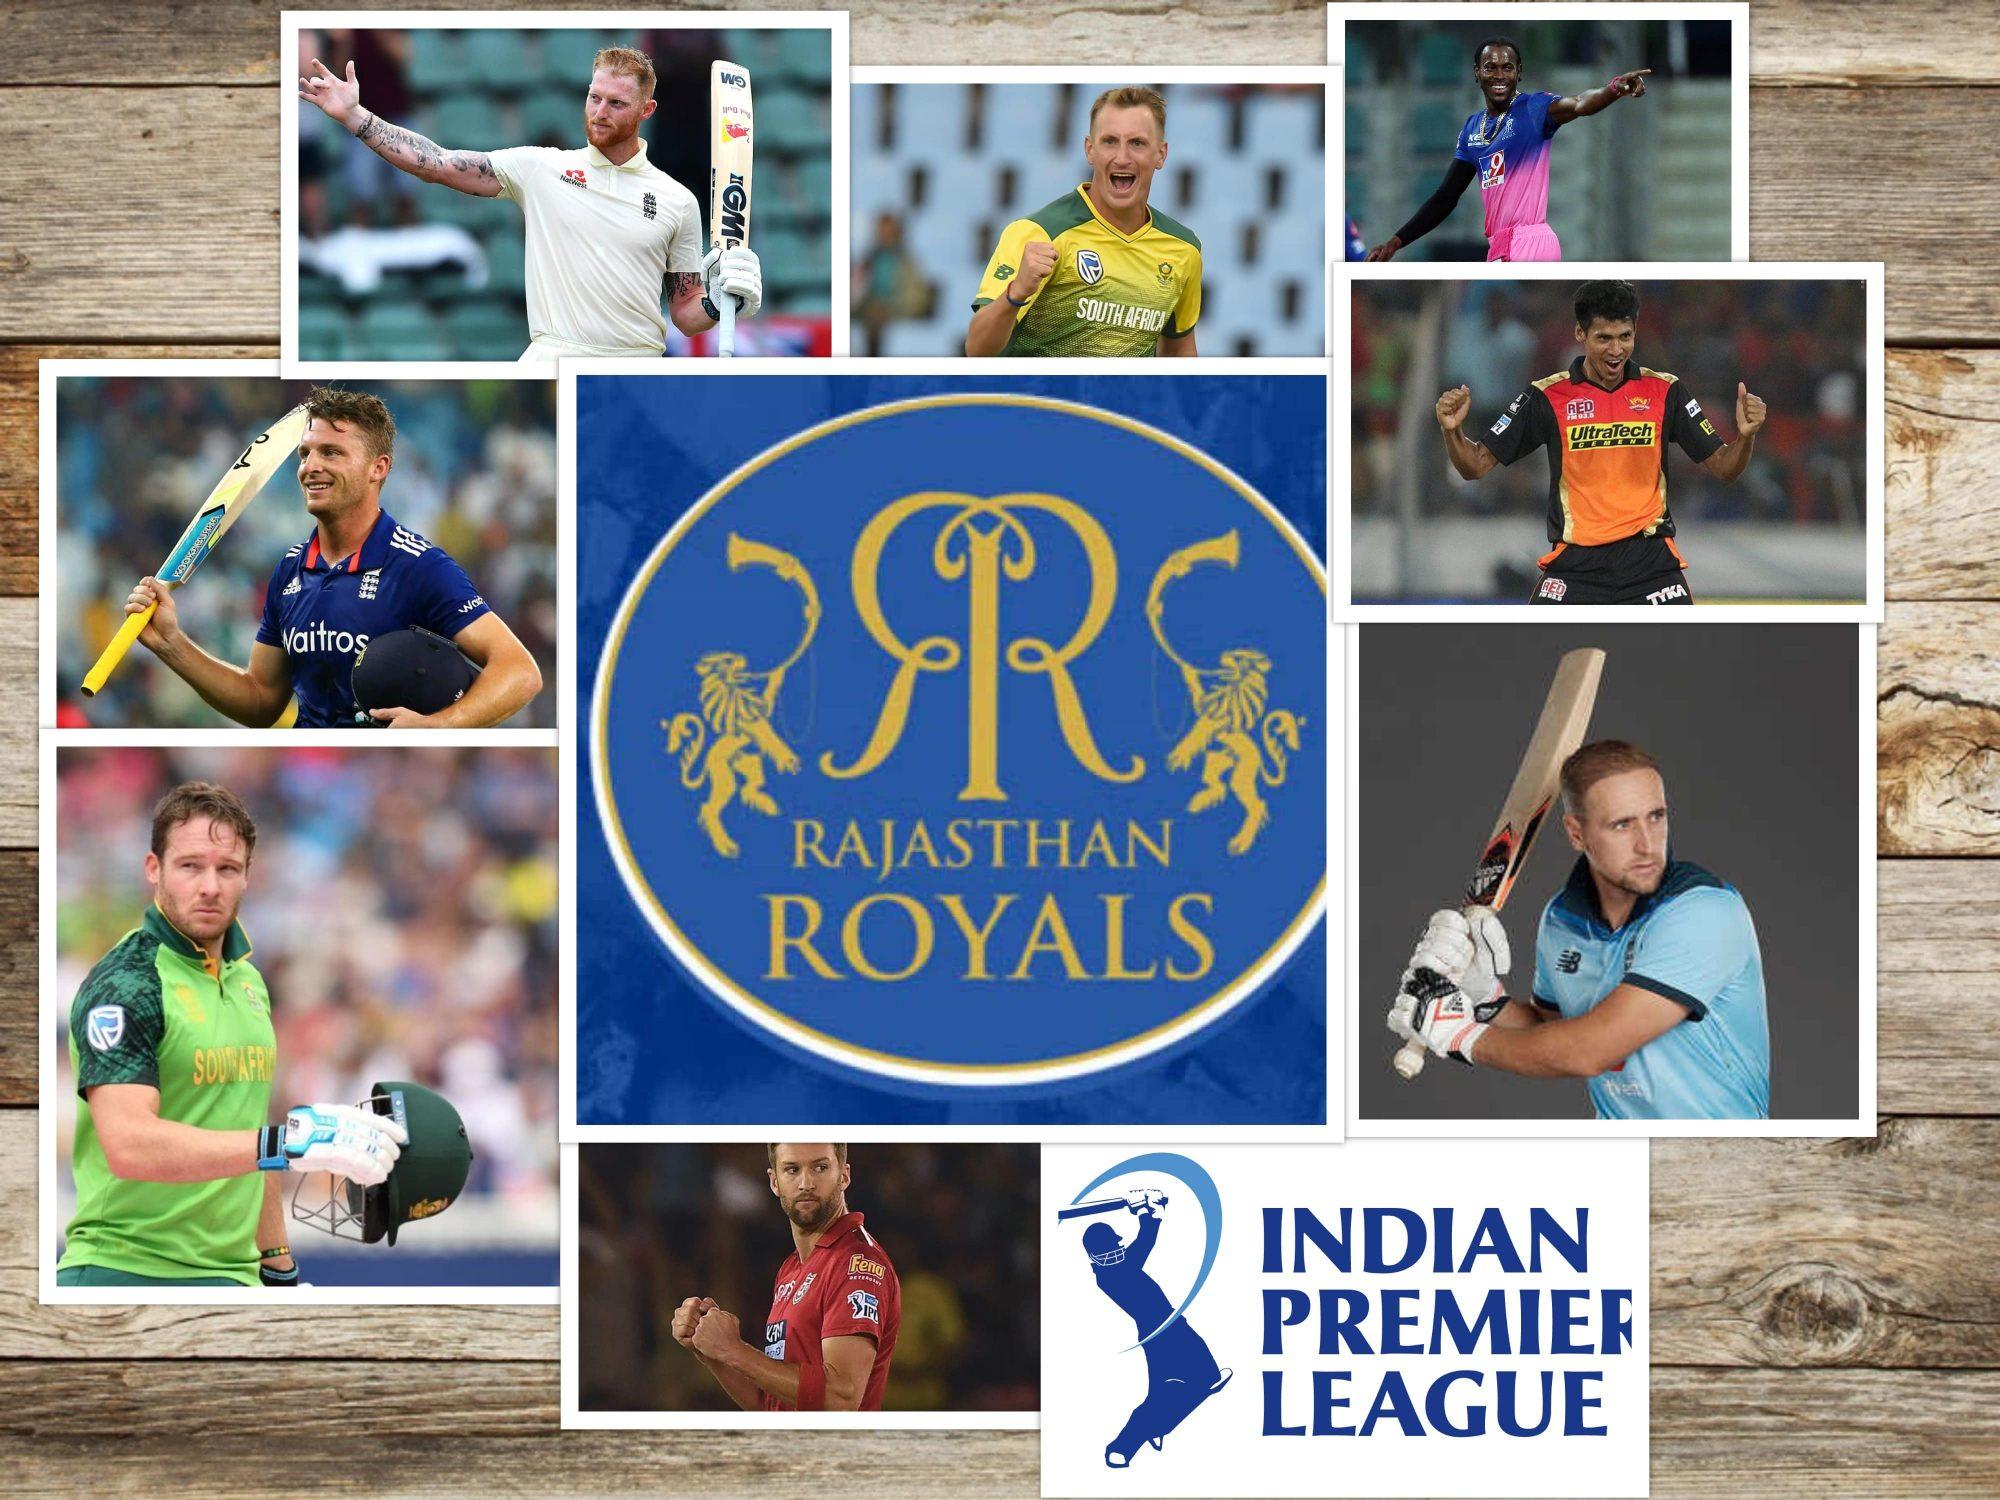 Rajasthan Royals Overseas Players